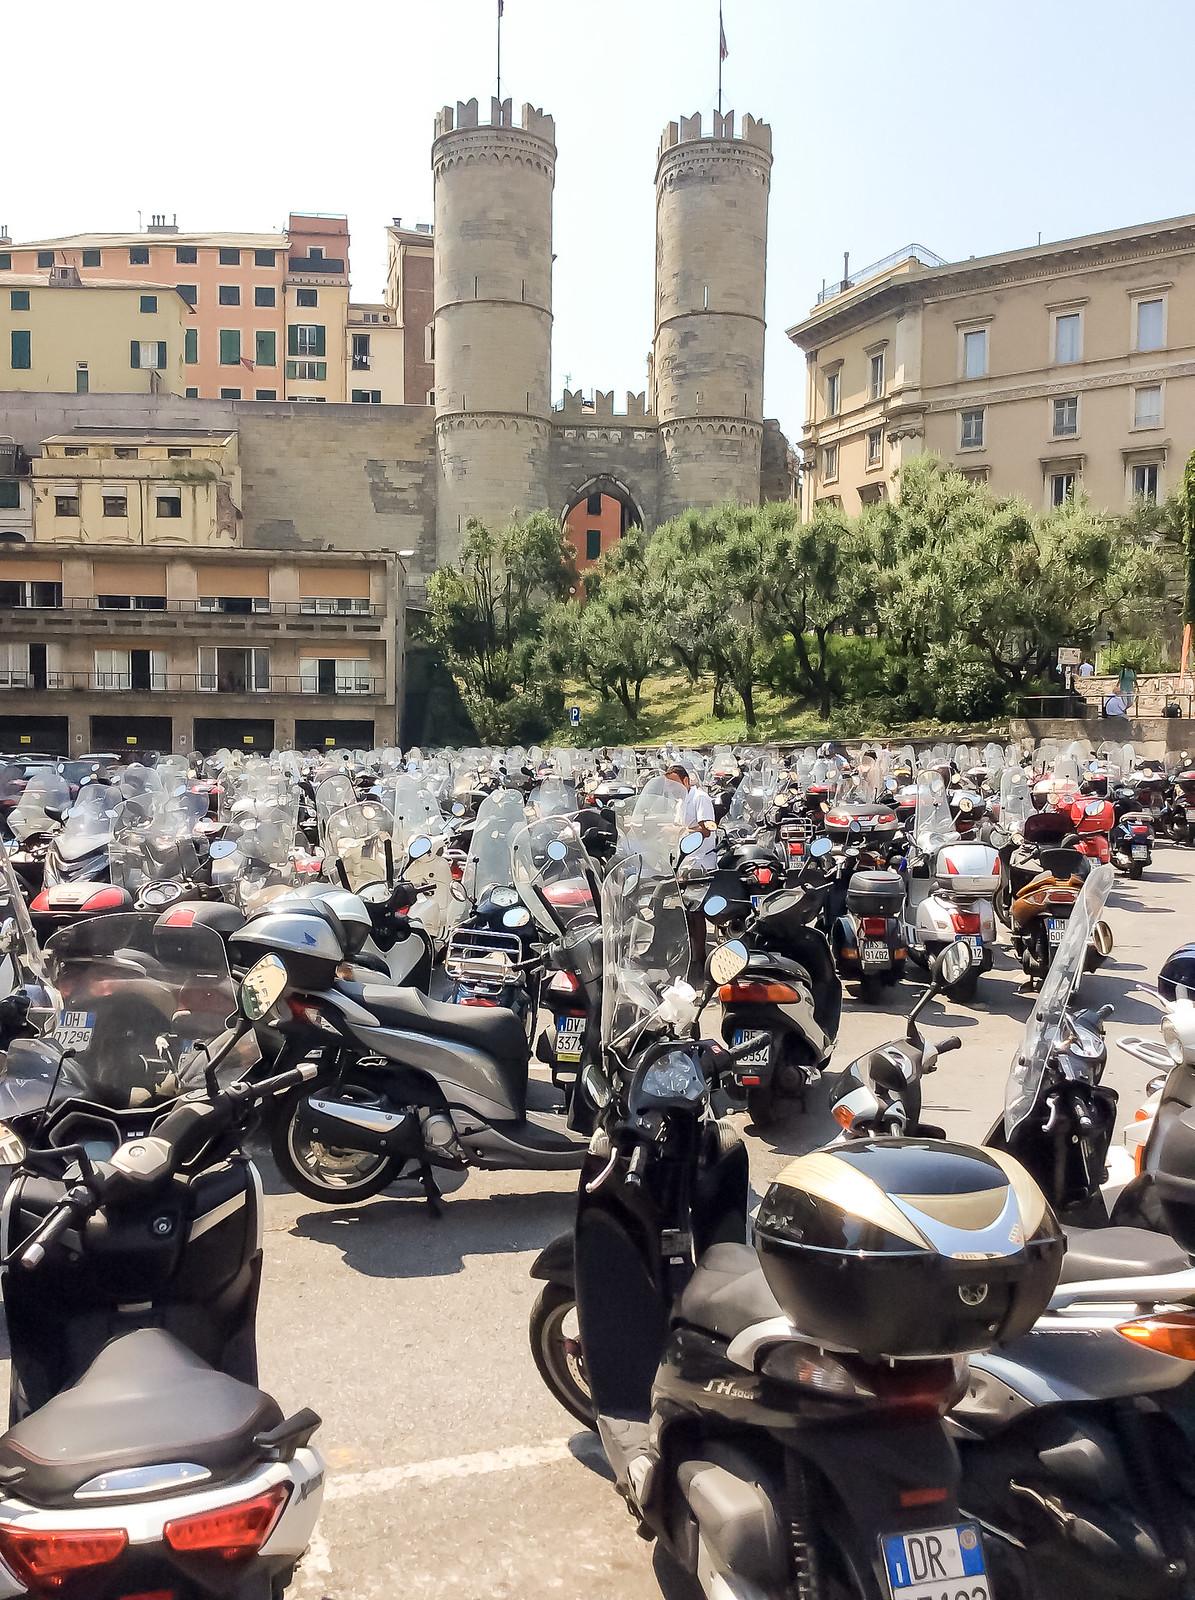 Генуя - Площадь Данте (Piazza Dante)